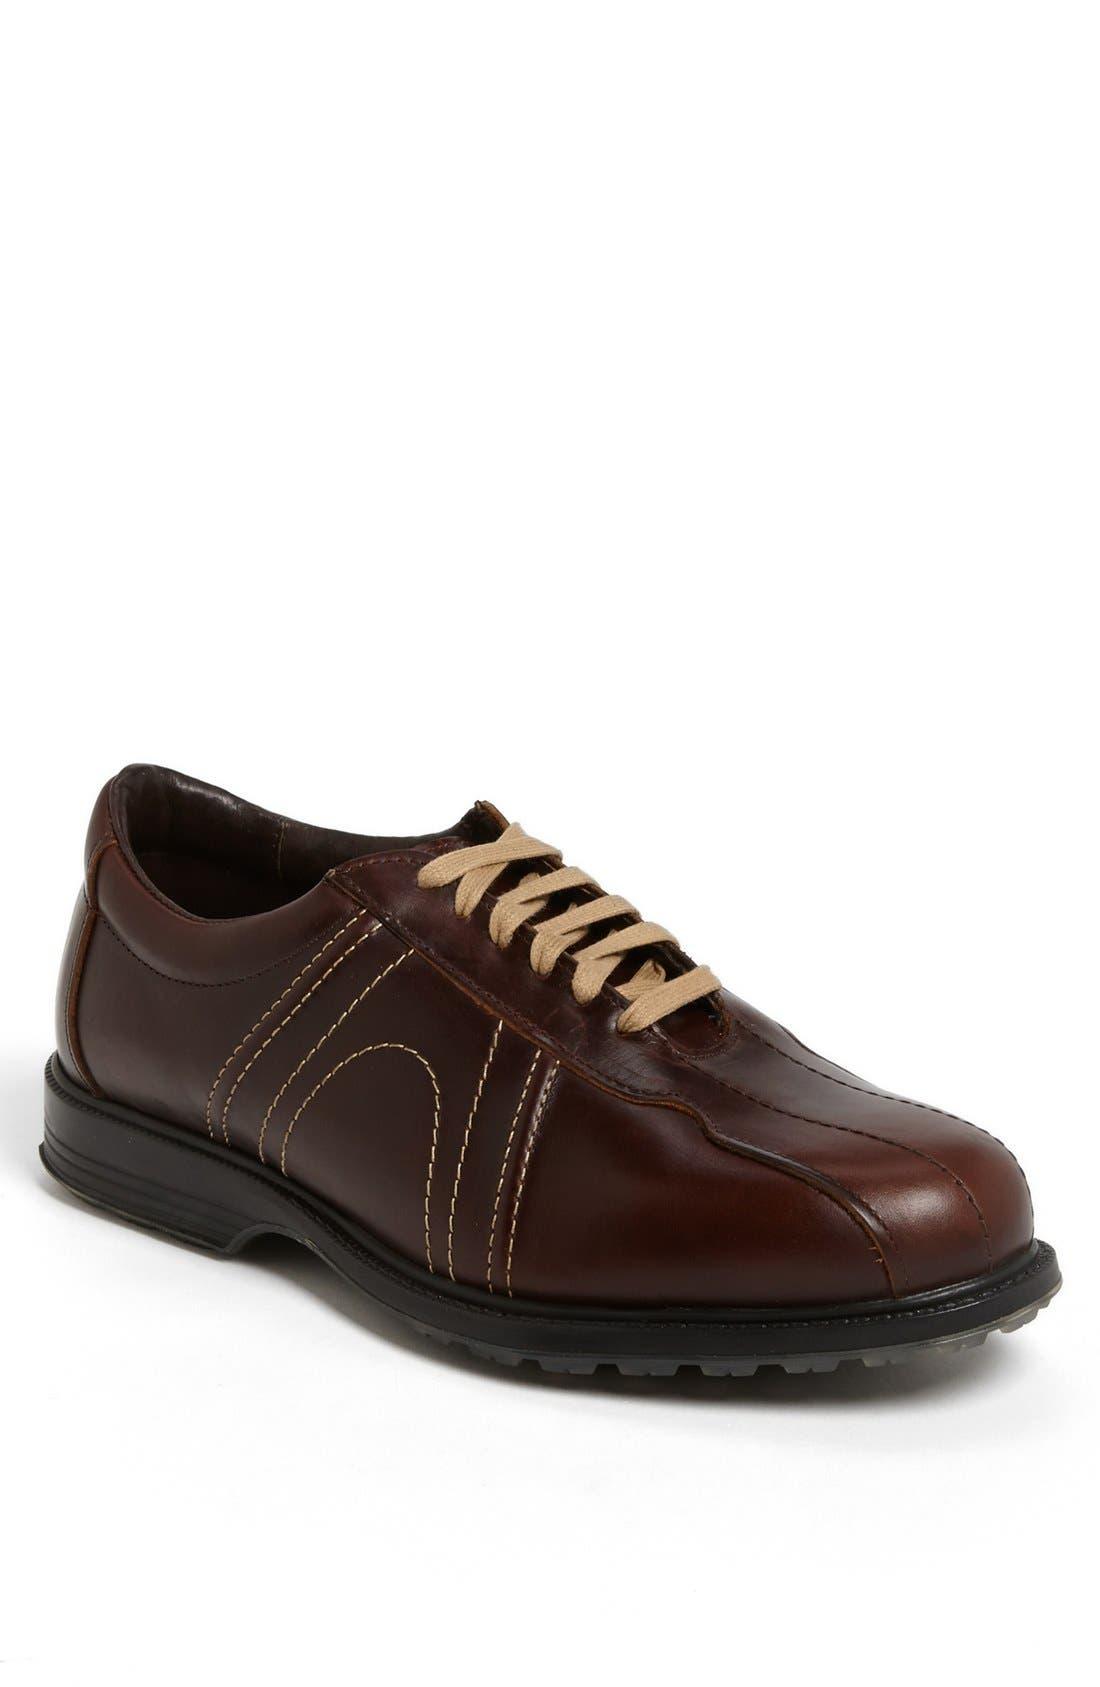 Alternate Image 1 Selected - Allen Edmonds 'Jack Nicklaus - Desert Mountain' Golf Shoe   (Men)